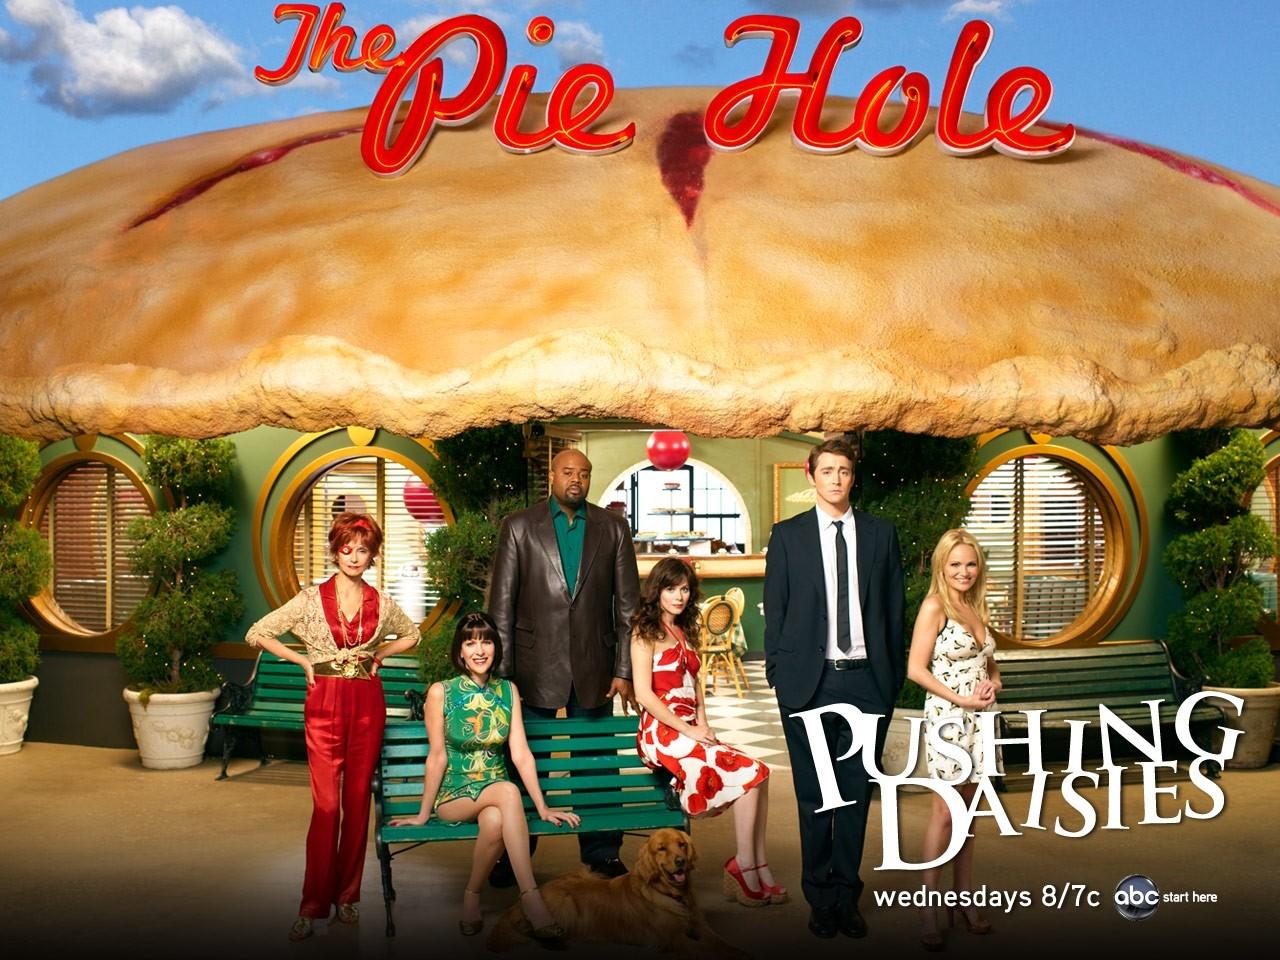 Wallpaper della serie Pushing Daisies